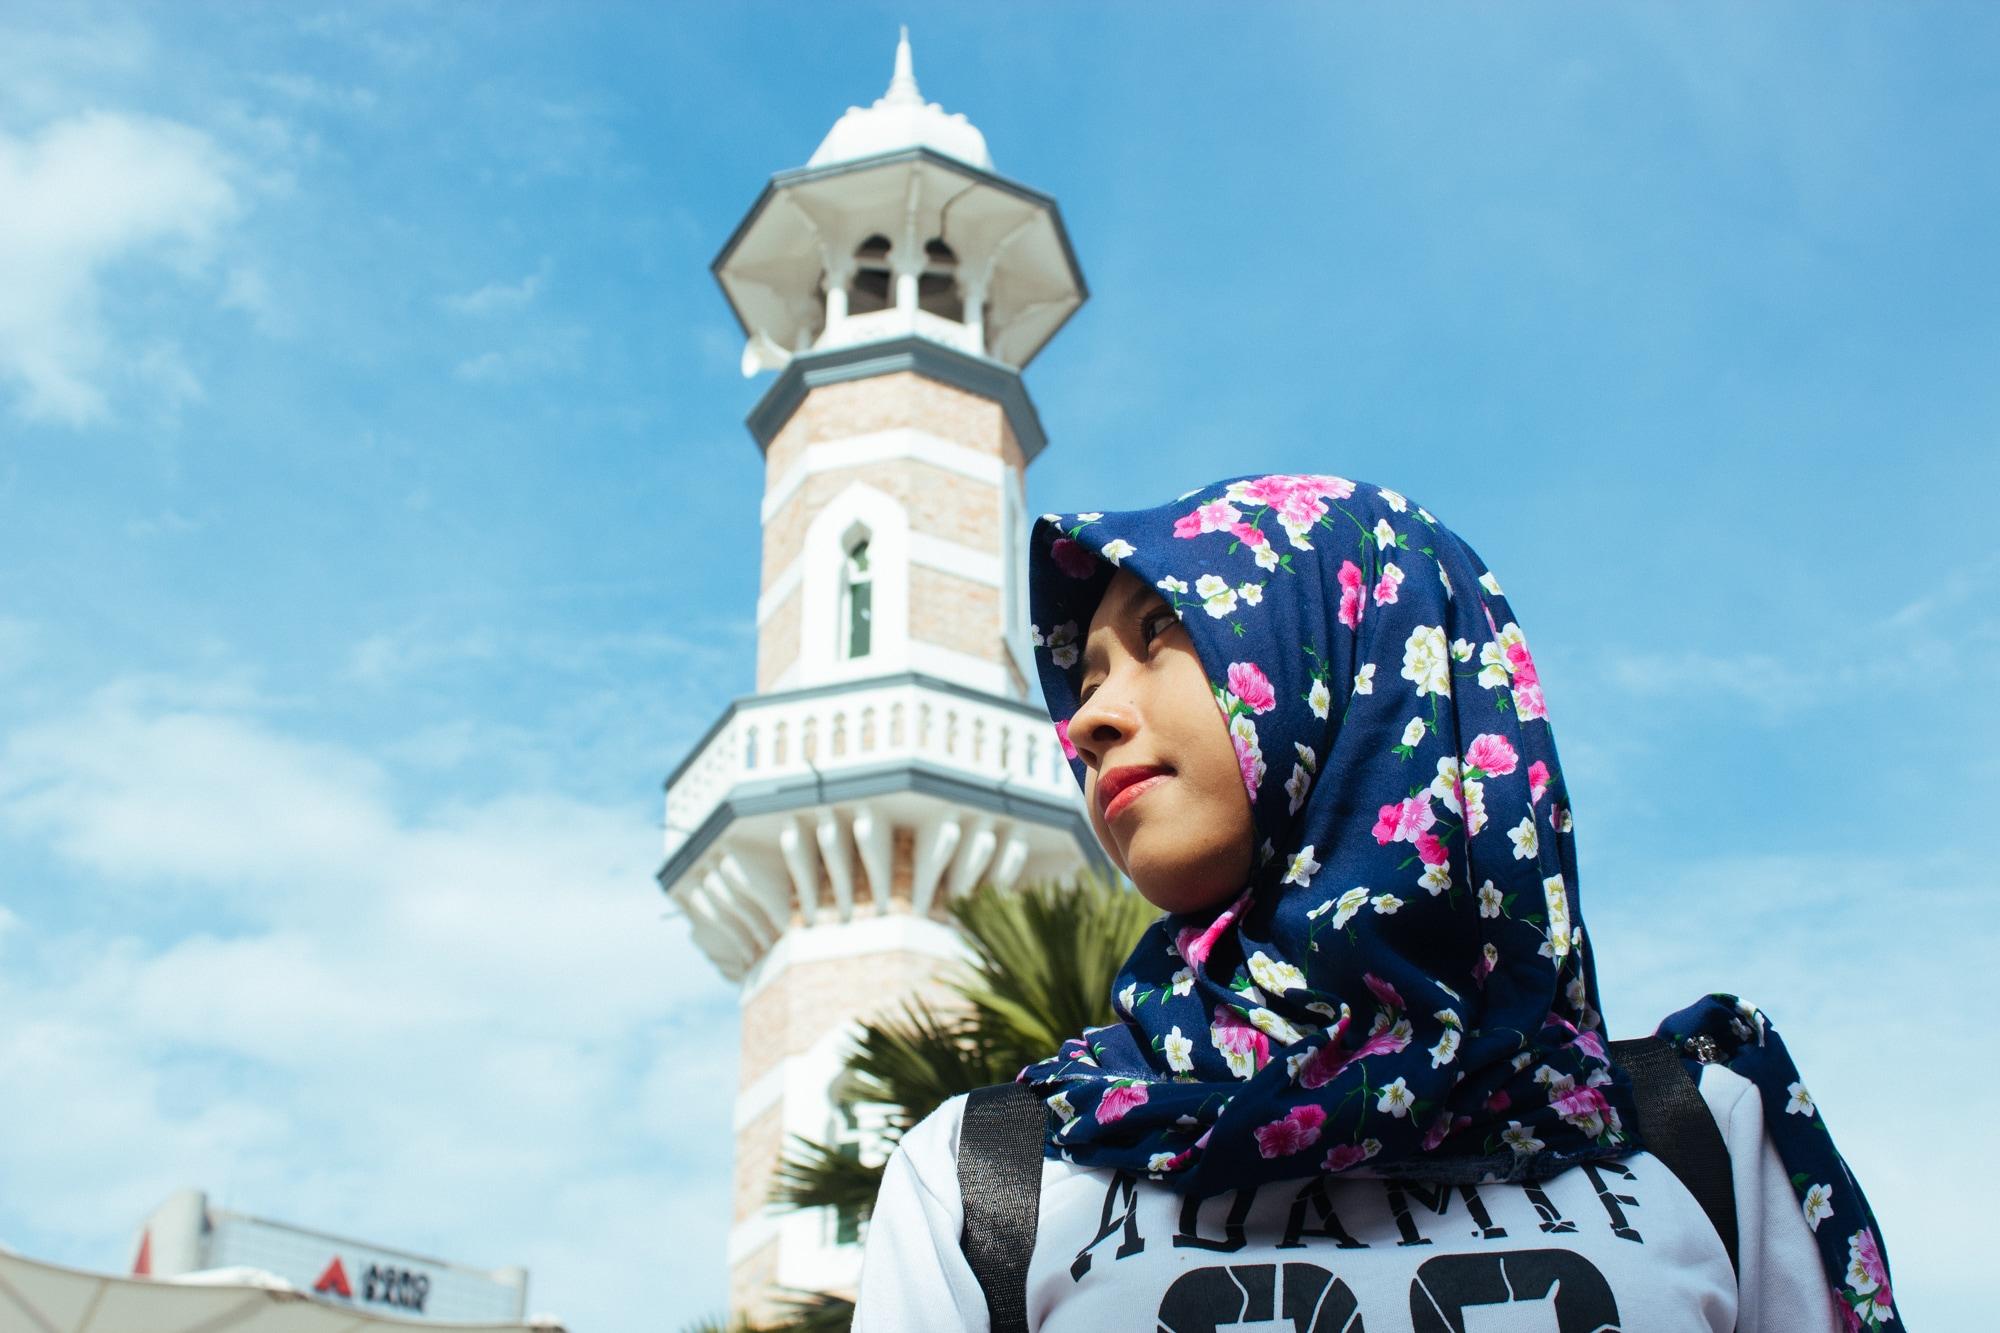 Celebrating Hari Raya at Masjid Jamek